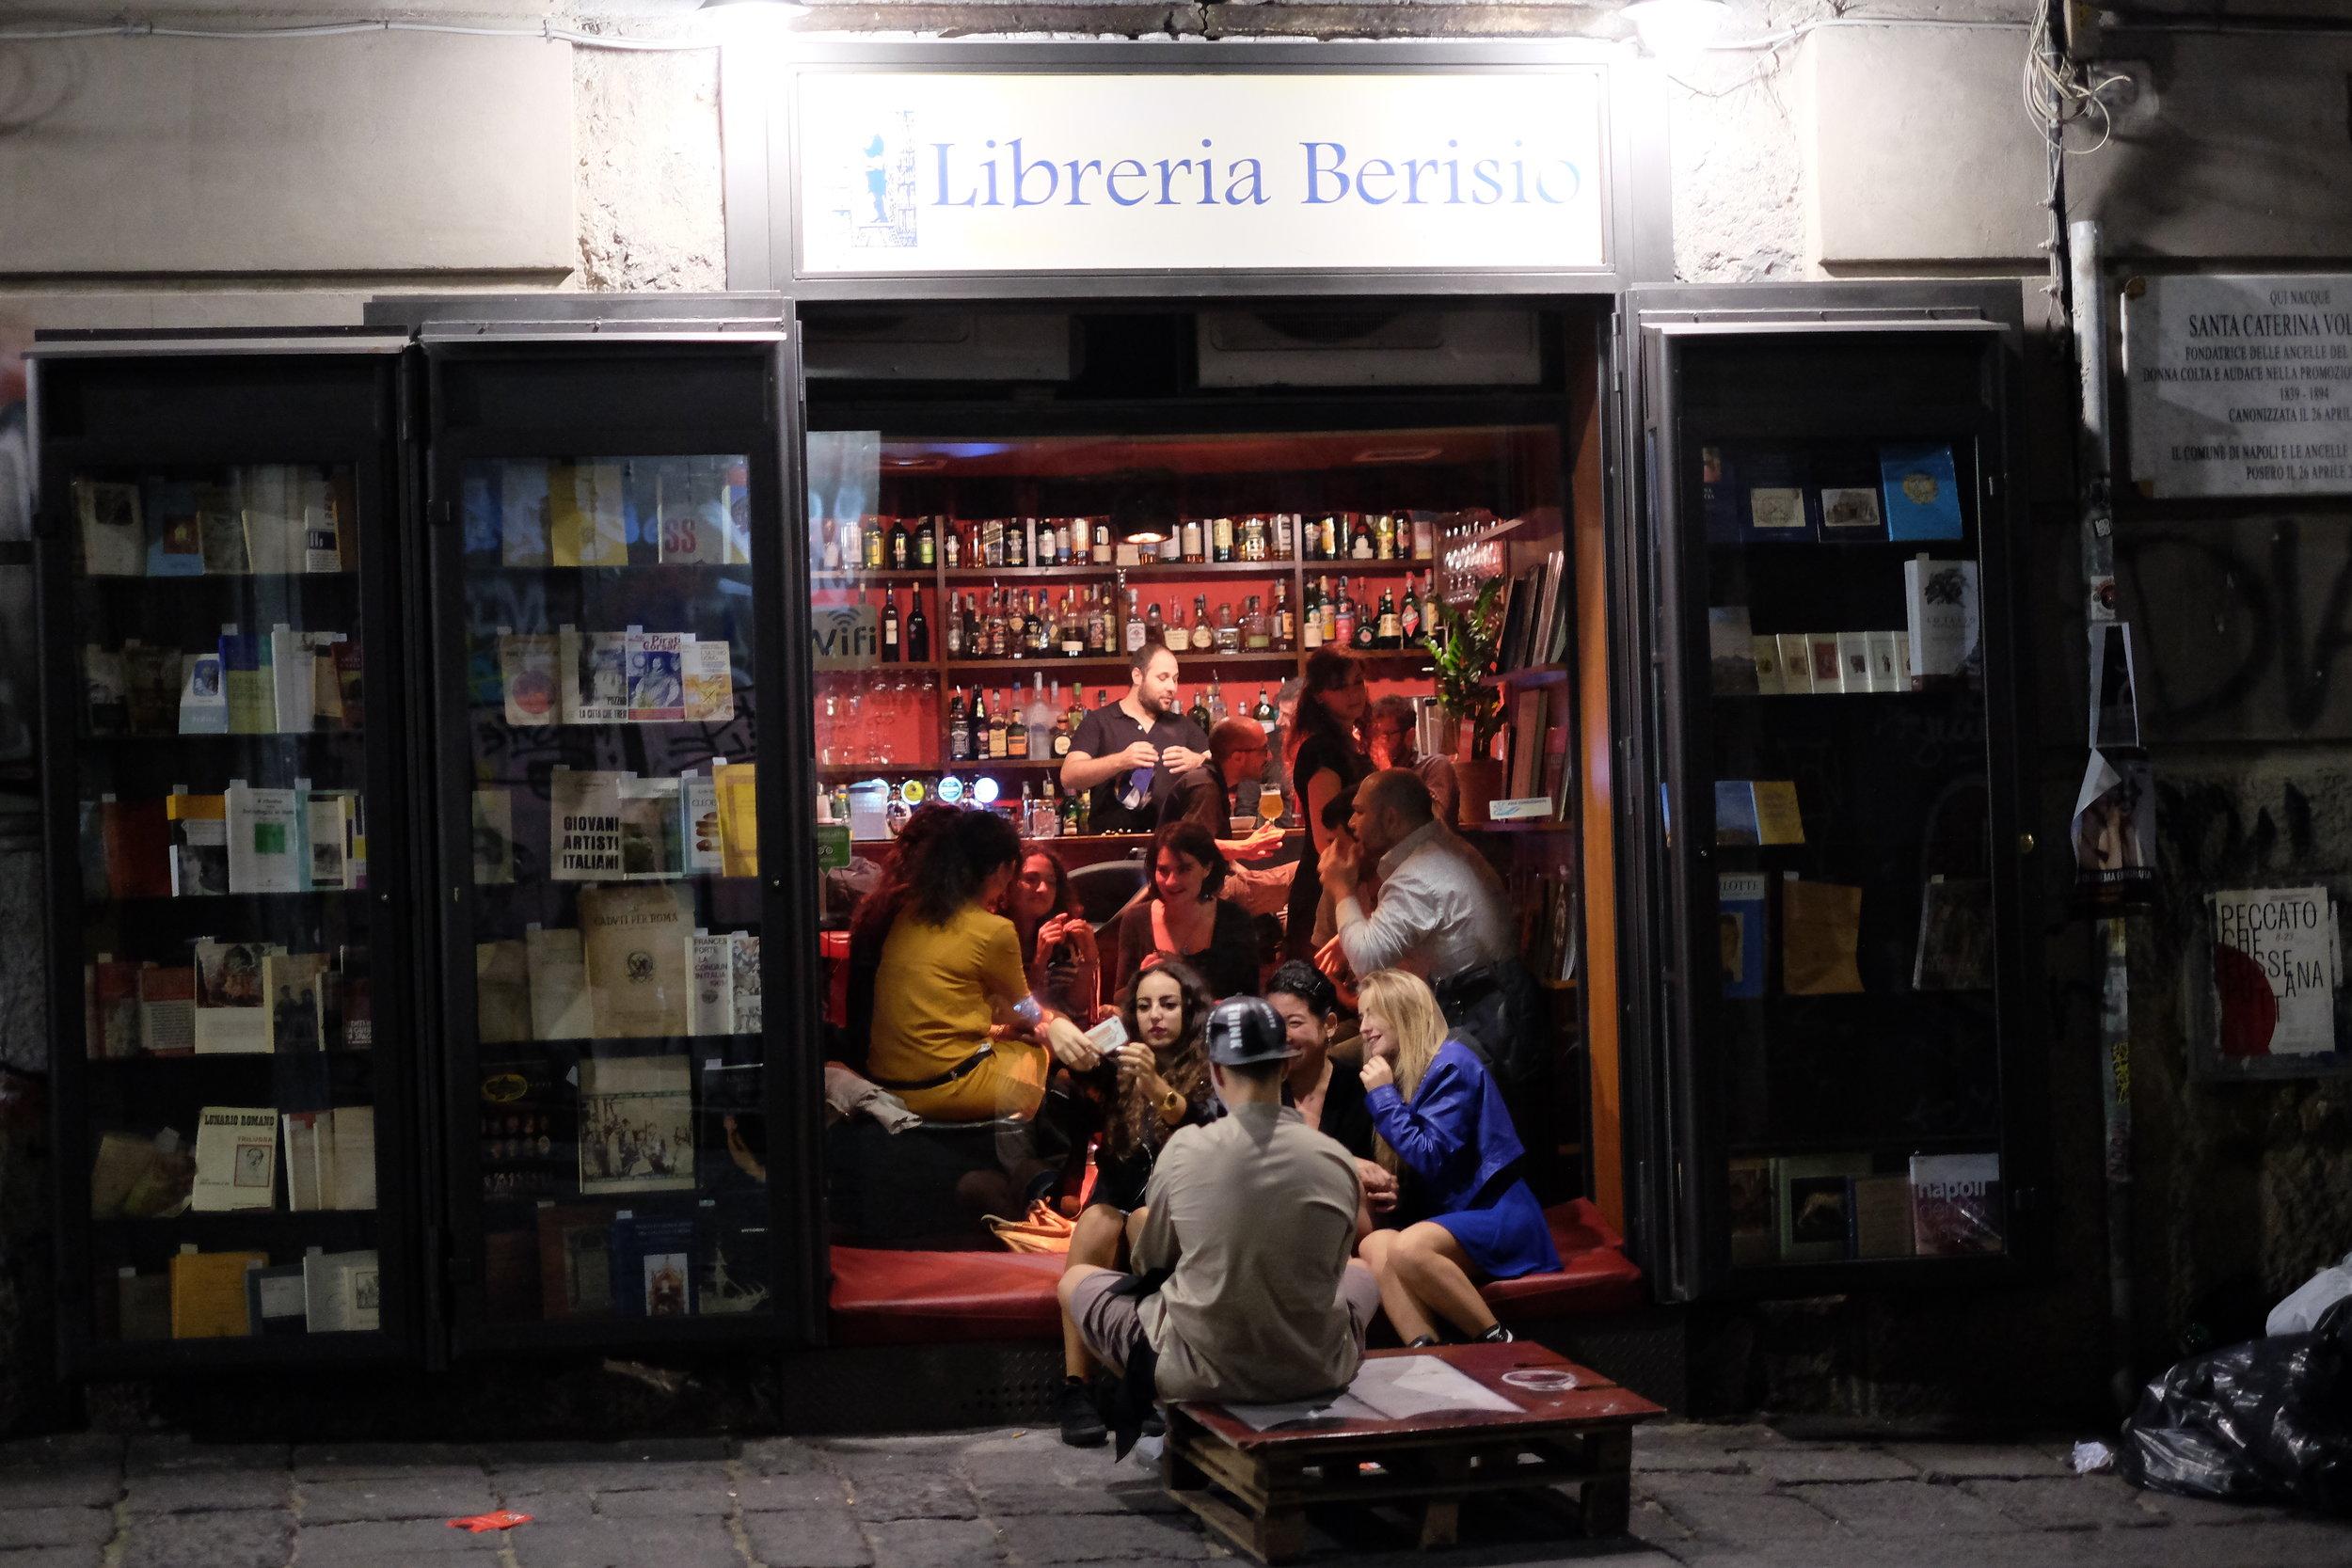 Another book shop/bar Libreria Berisio, Via Port'Alba, 28, 80134 Napoli.